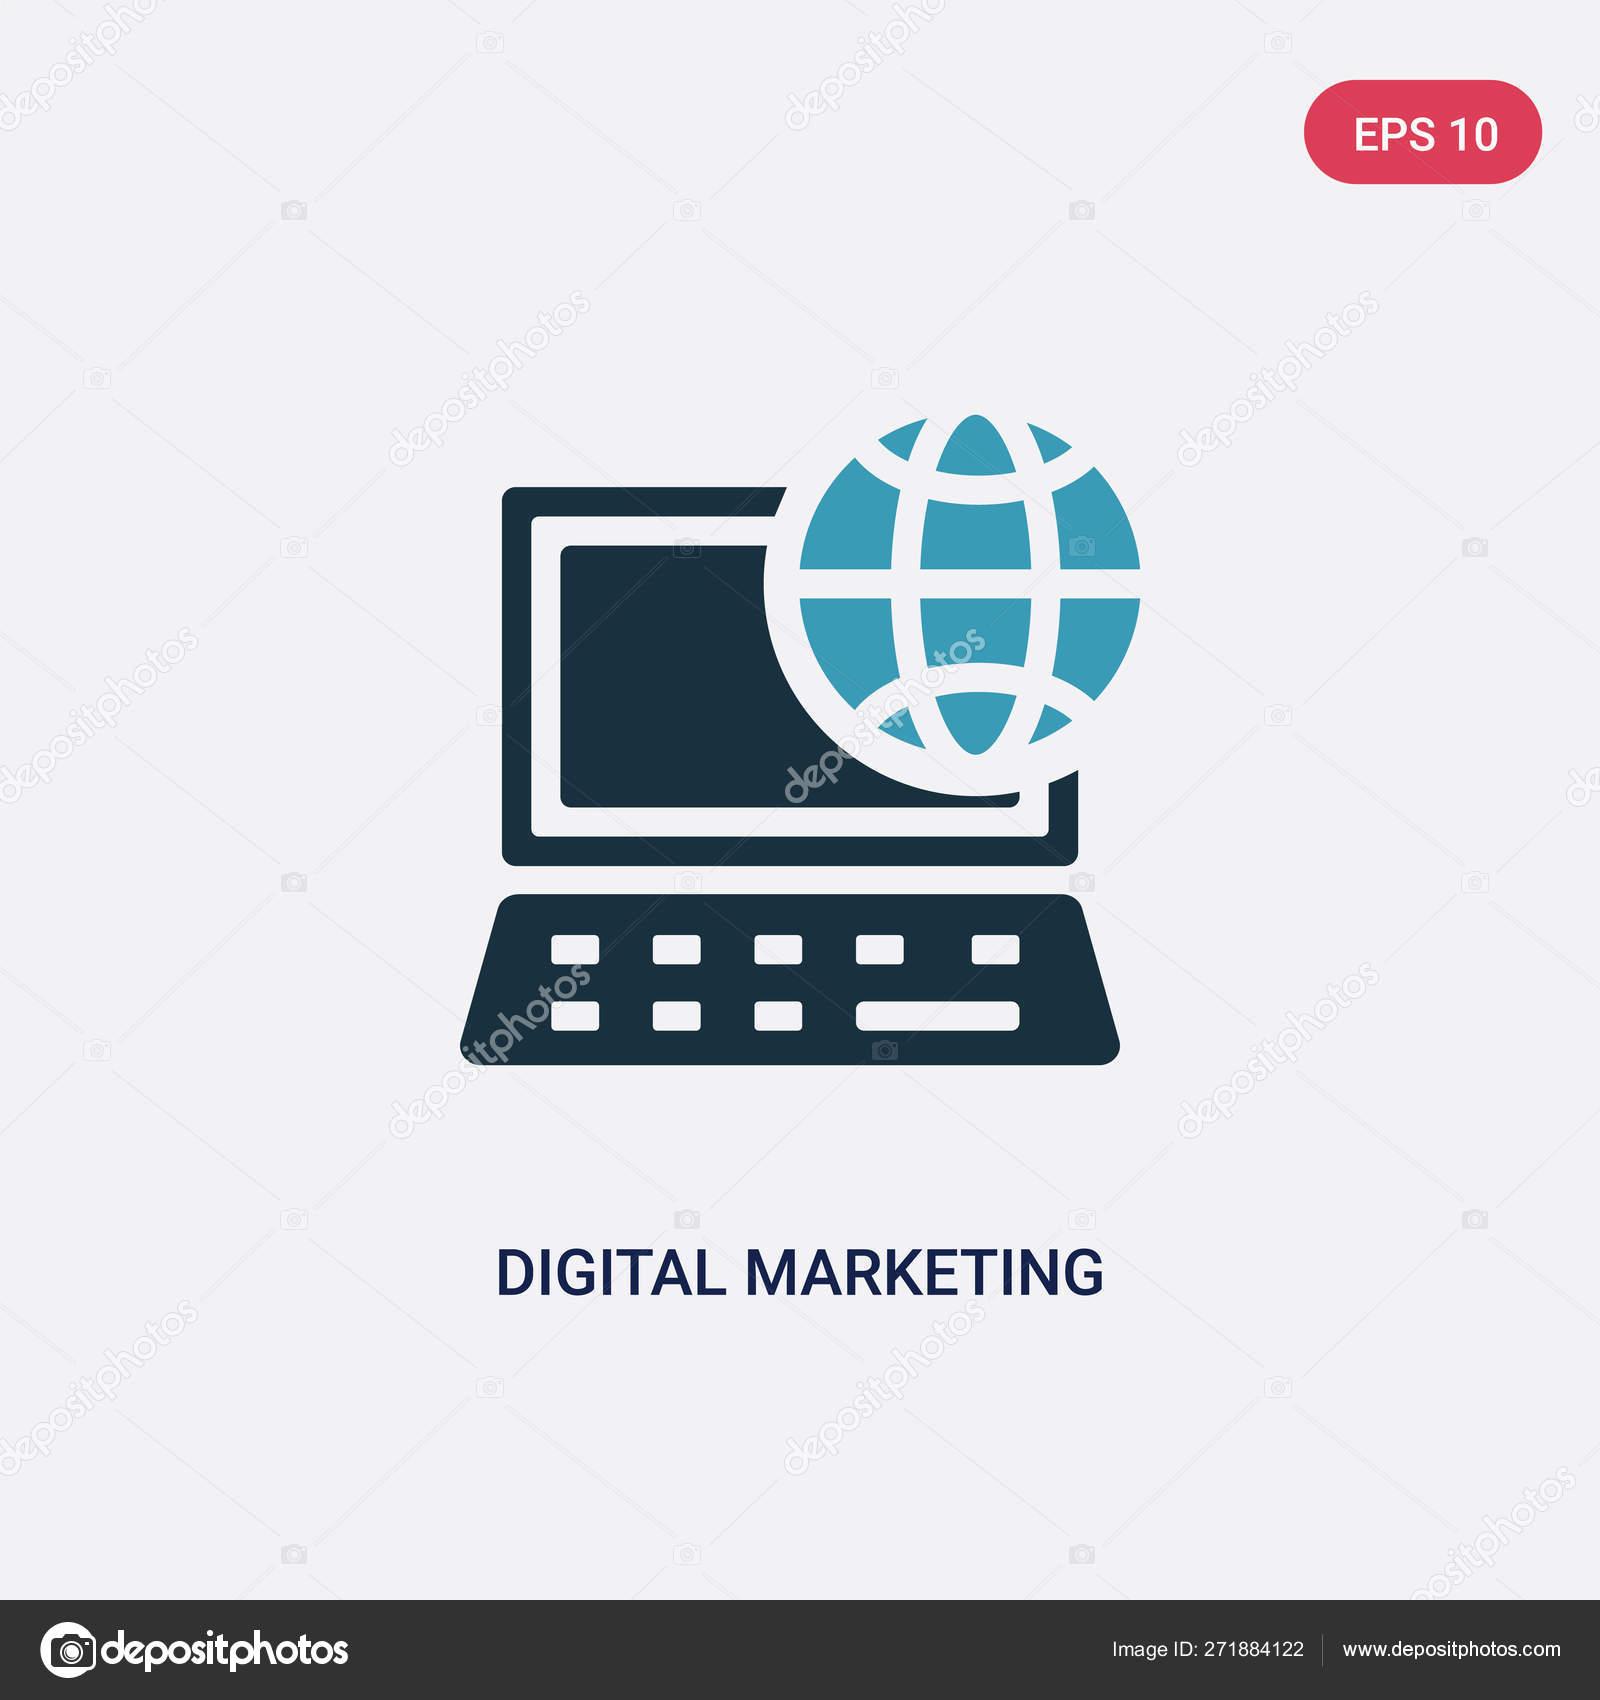 two color digital marketing vector icon from social media market stock vector c zaurrahimov 271884122 two color digital marketing vector icon from social media market stock vector c zaurrahimov 271884122